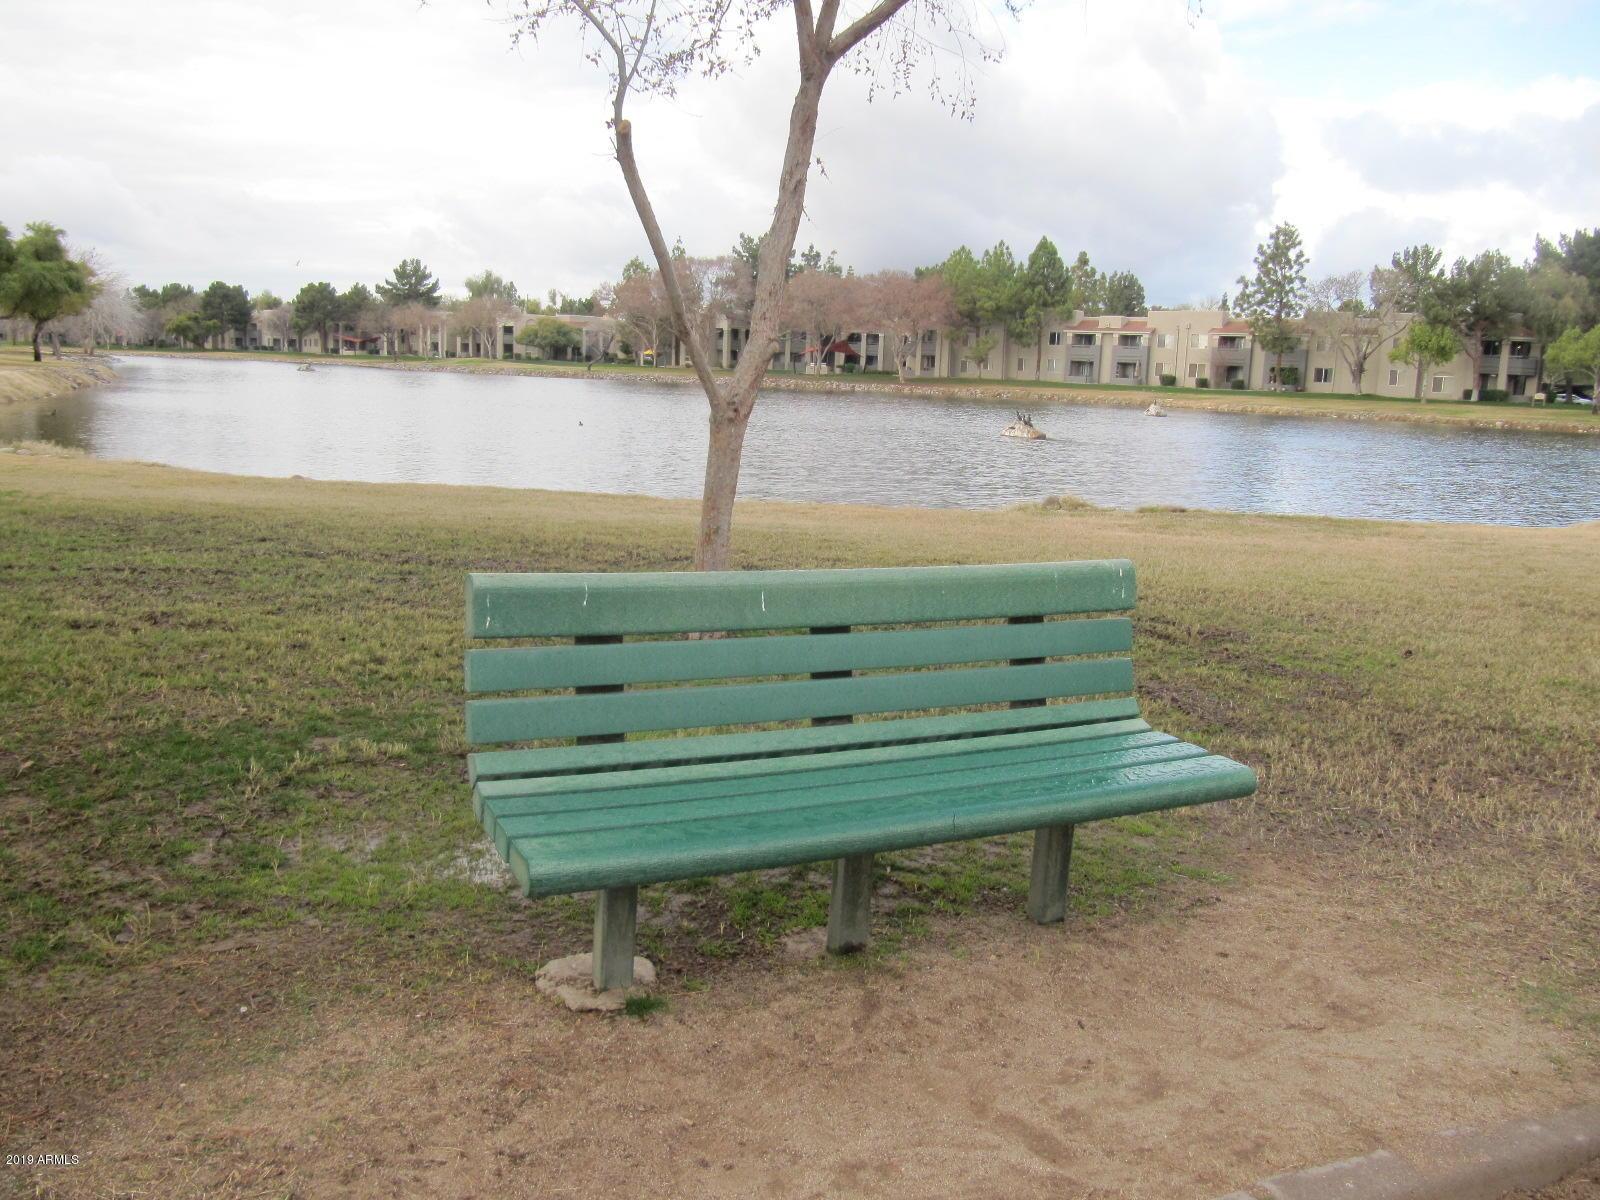 565 N Aspen Drive, Chandler, AZ 85226 - Phoenix Relocation Source